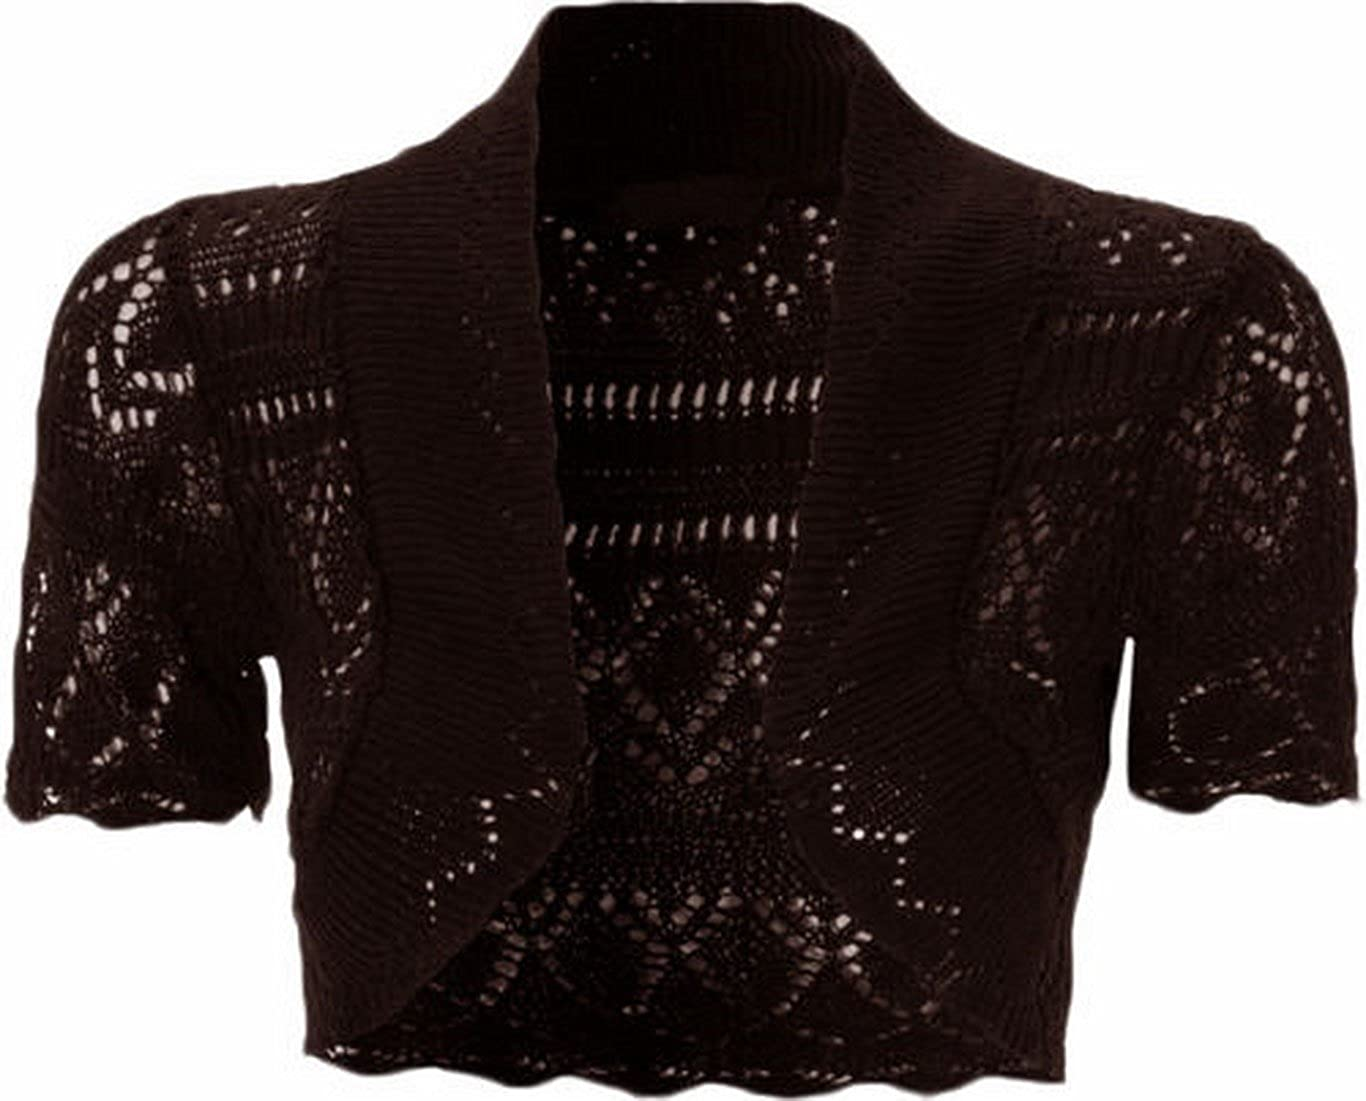 Womens Knitted Bolero Shrug Short Sleeve Crochet Shrug (XL, Brown)